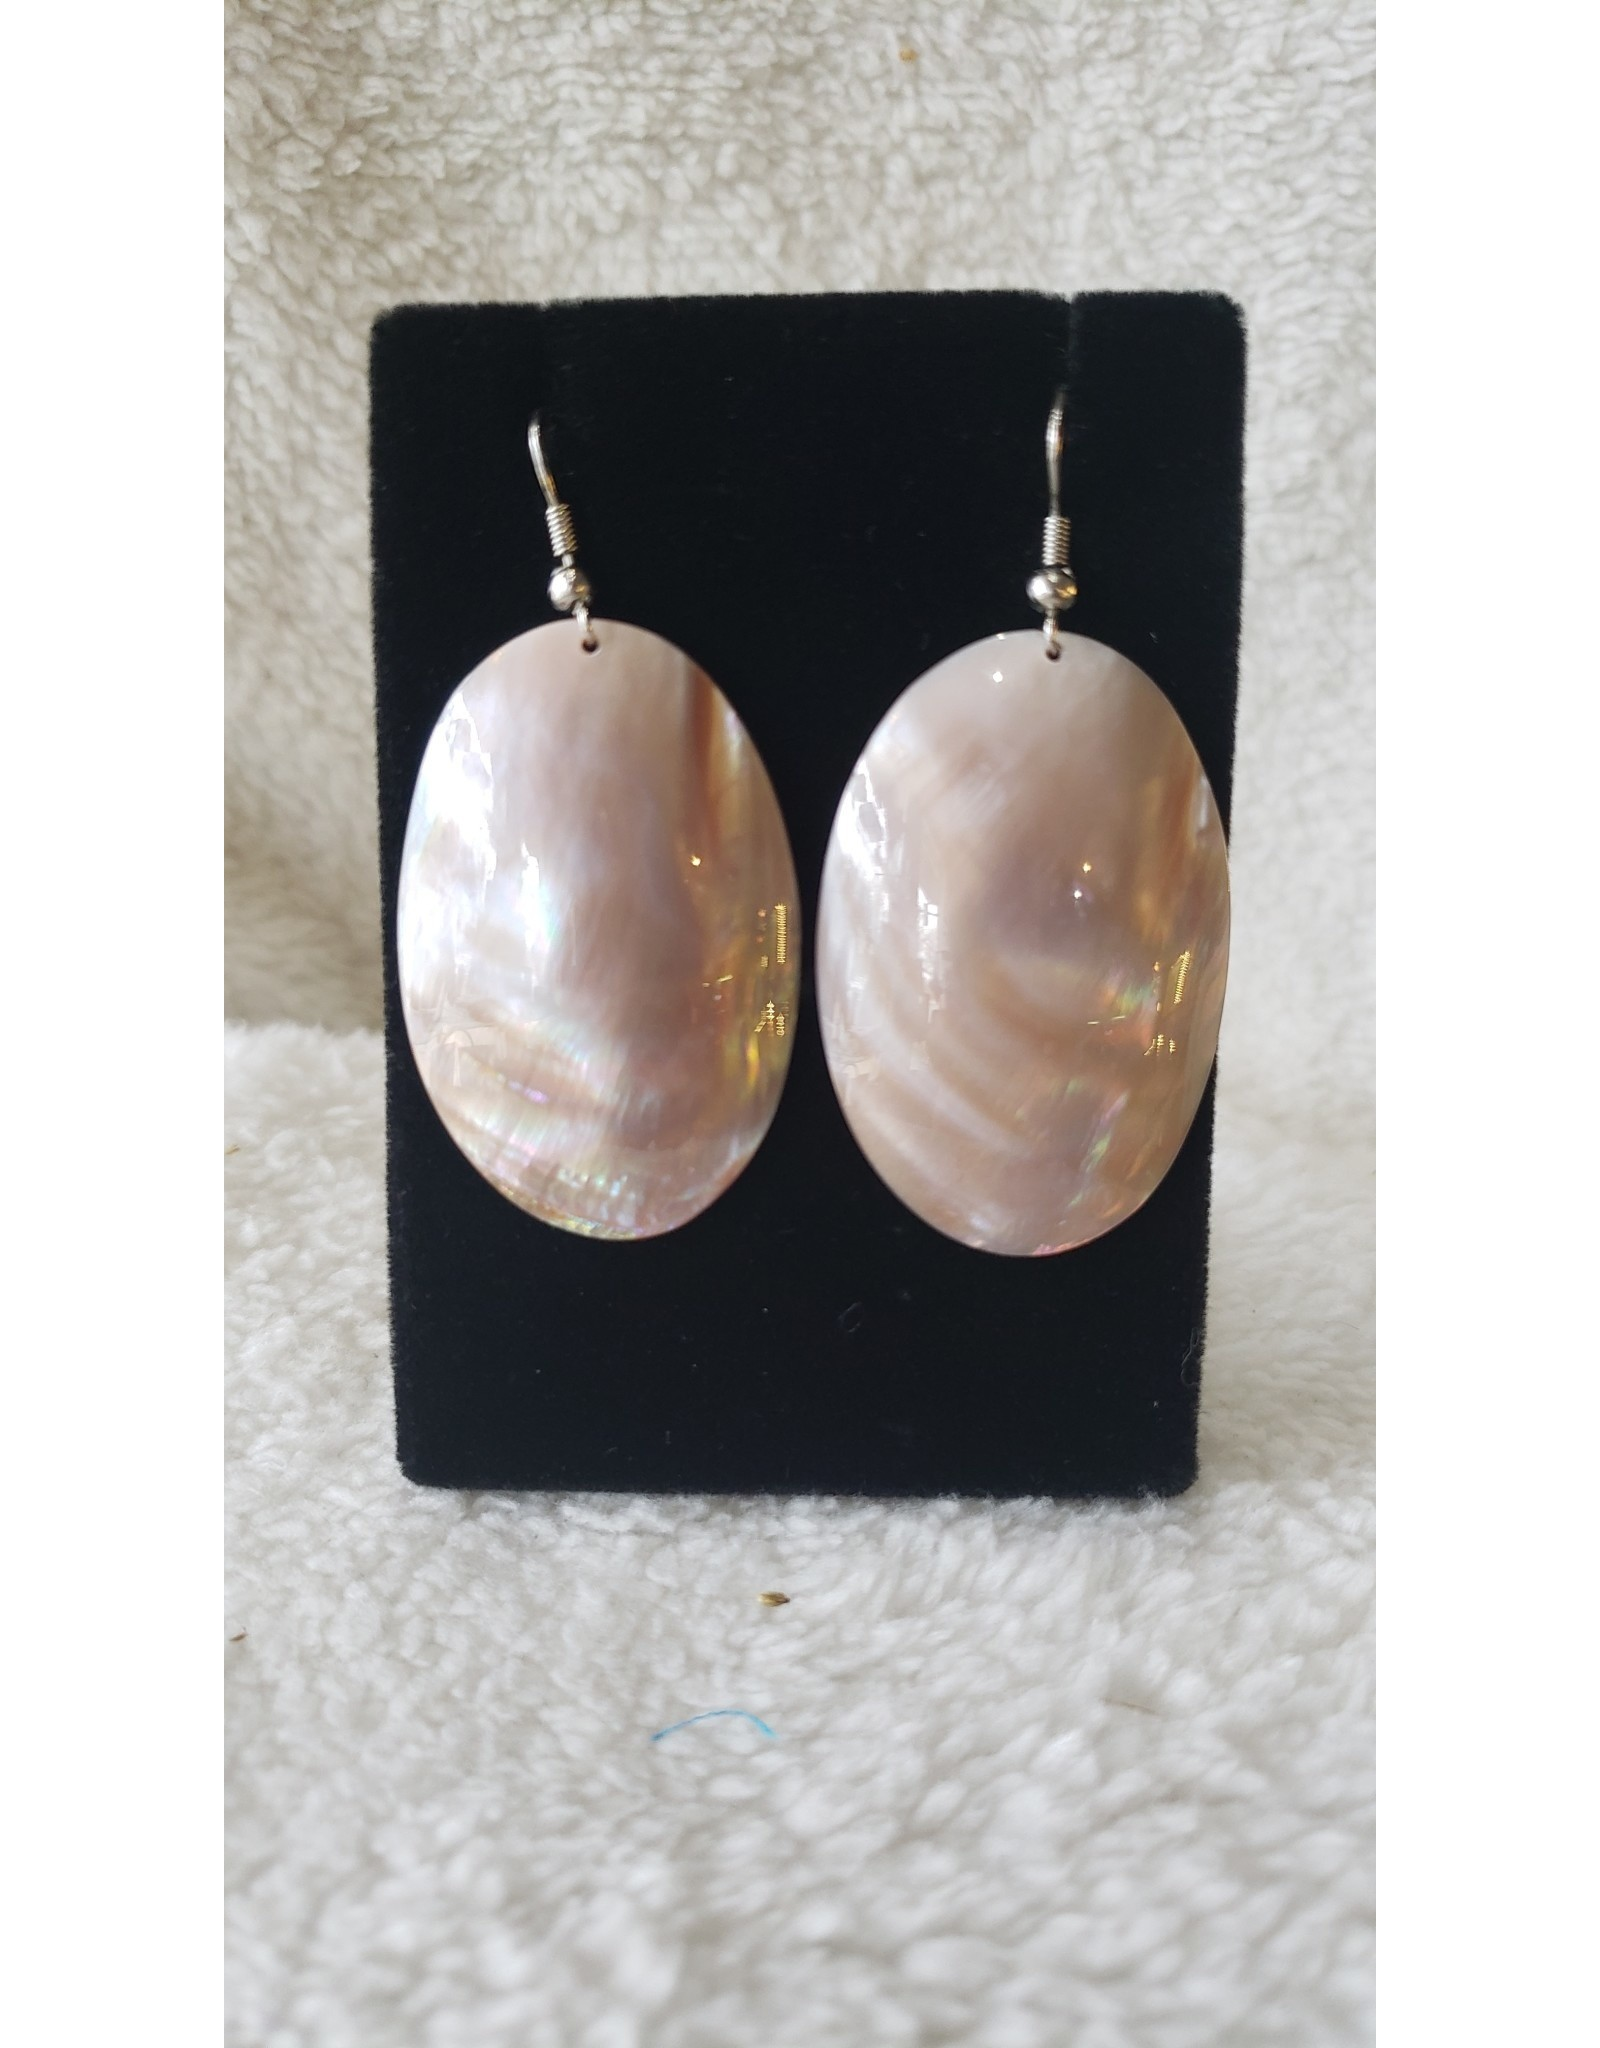 Large Oval Shell Earrings